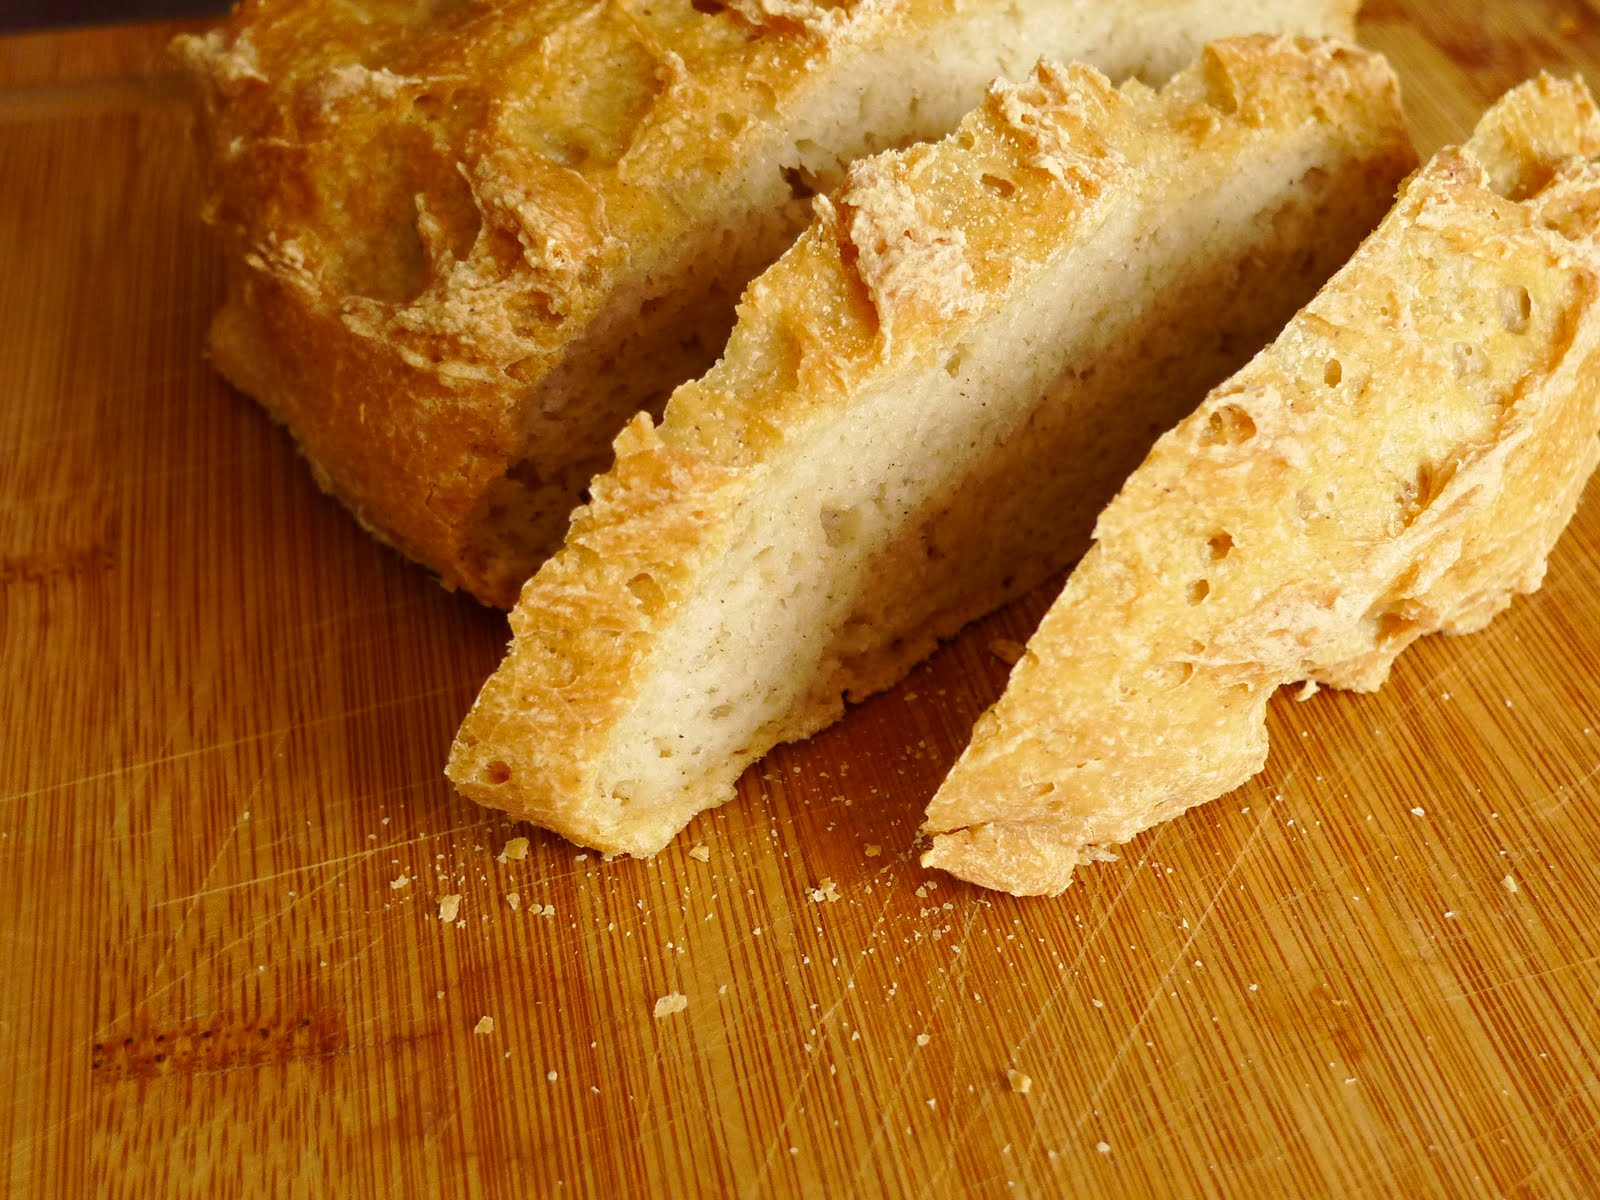 Gluten-free Gourmand: Gluten-free Boule Bread - Second Loaf